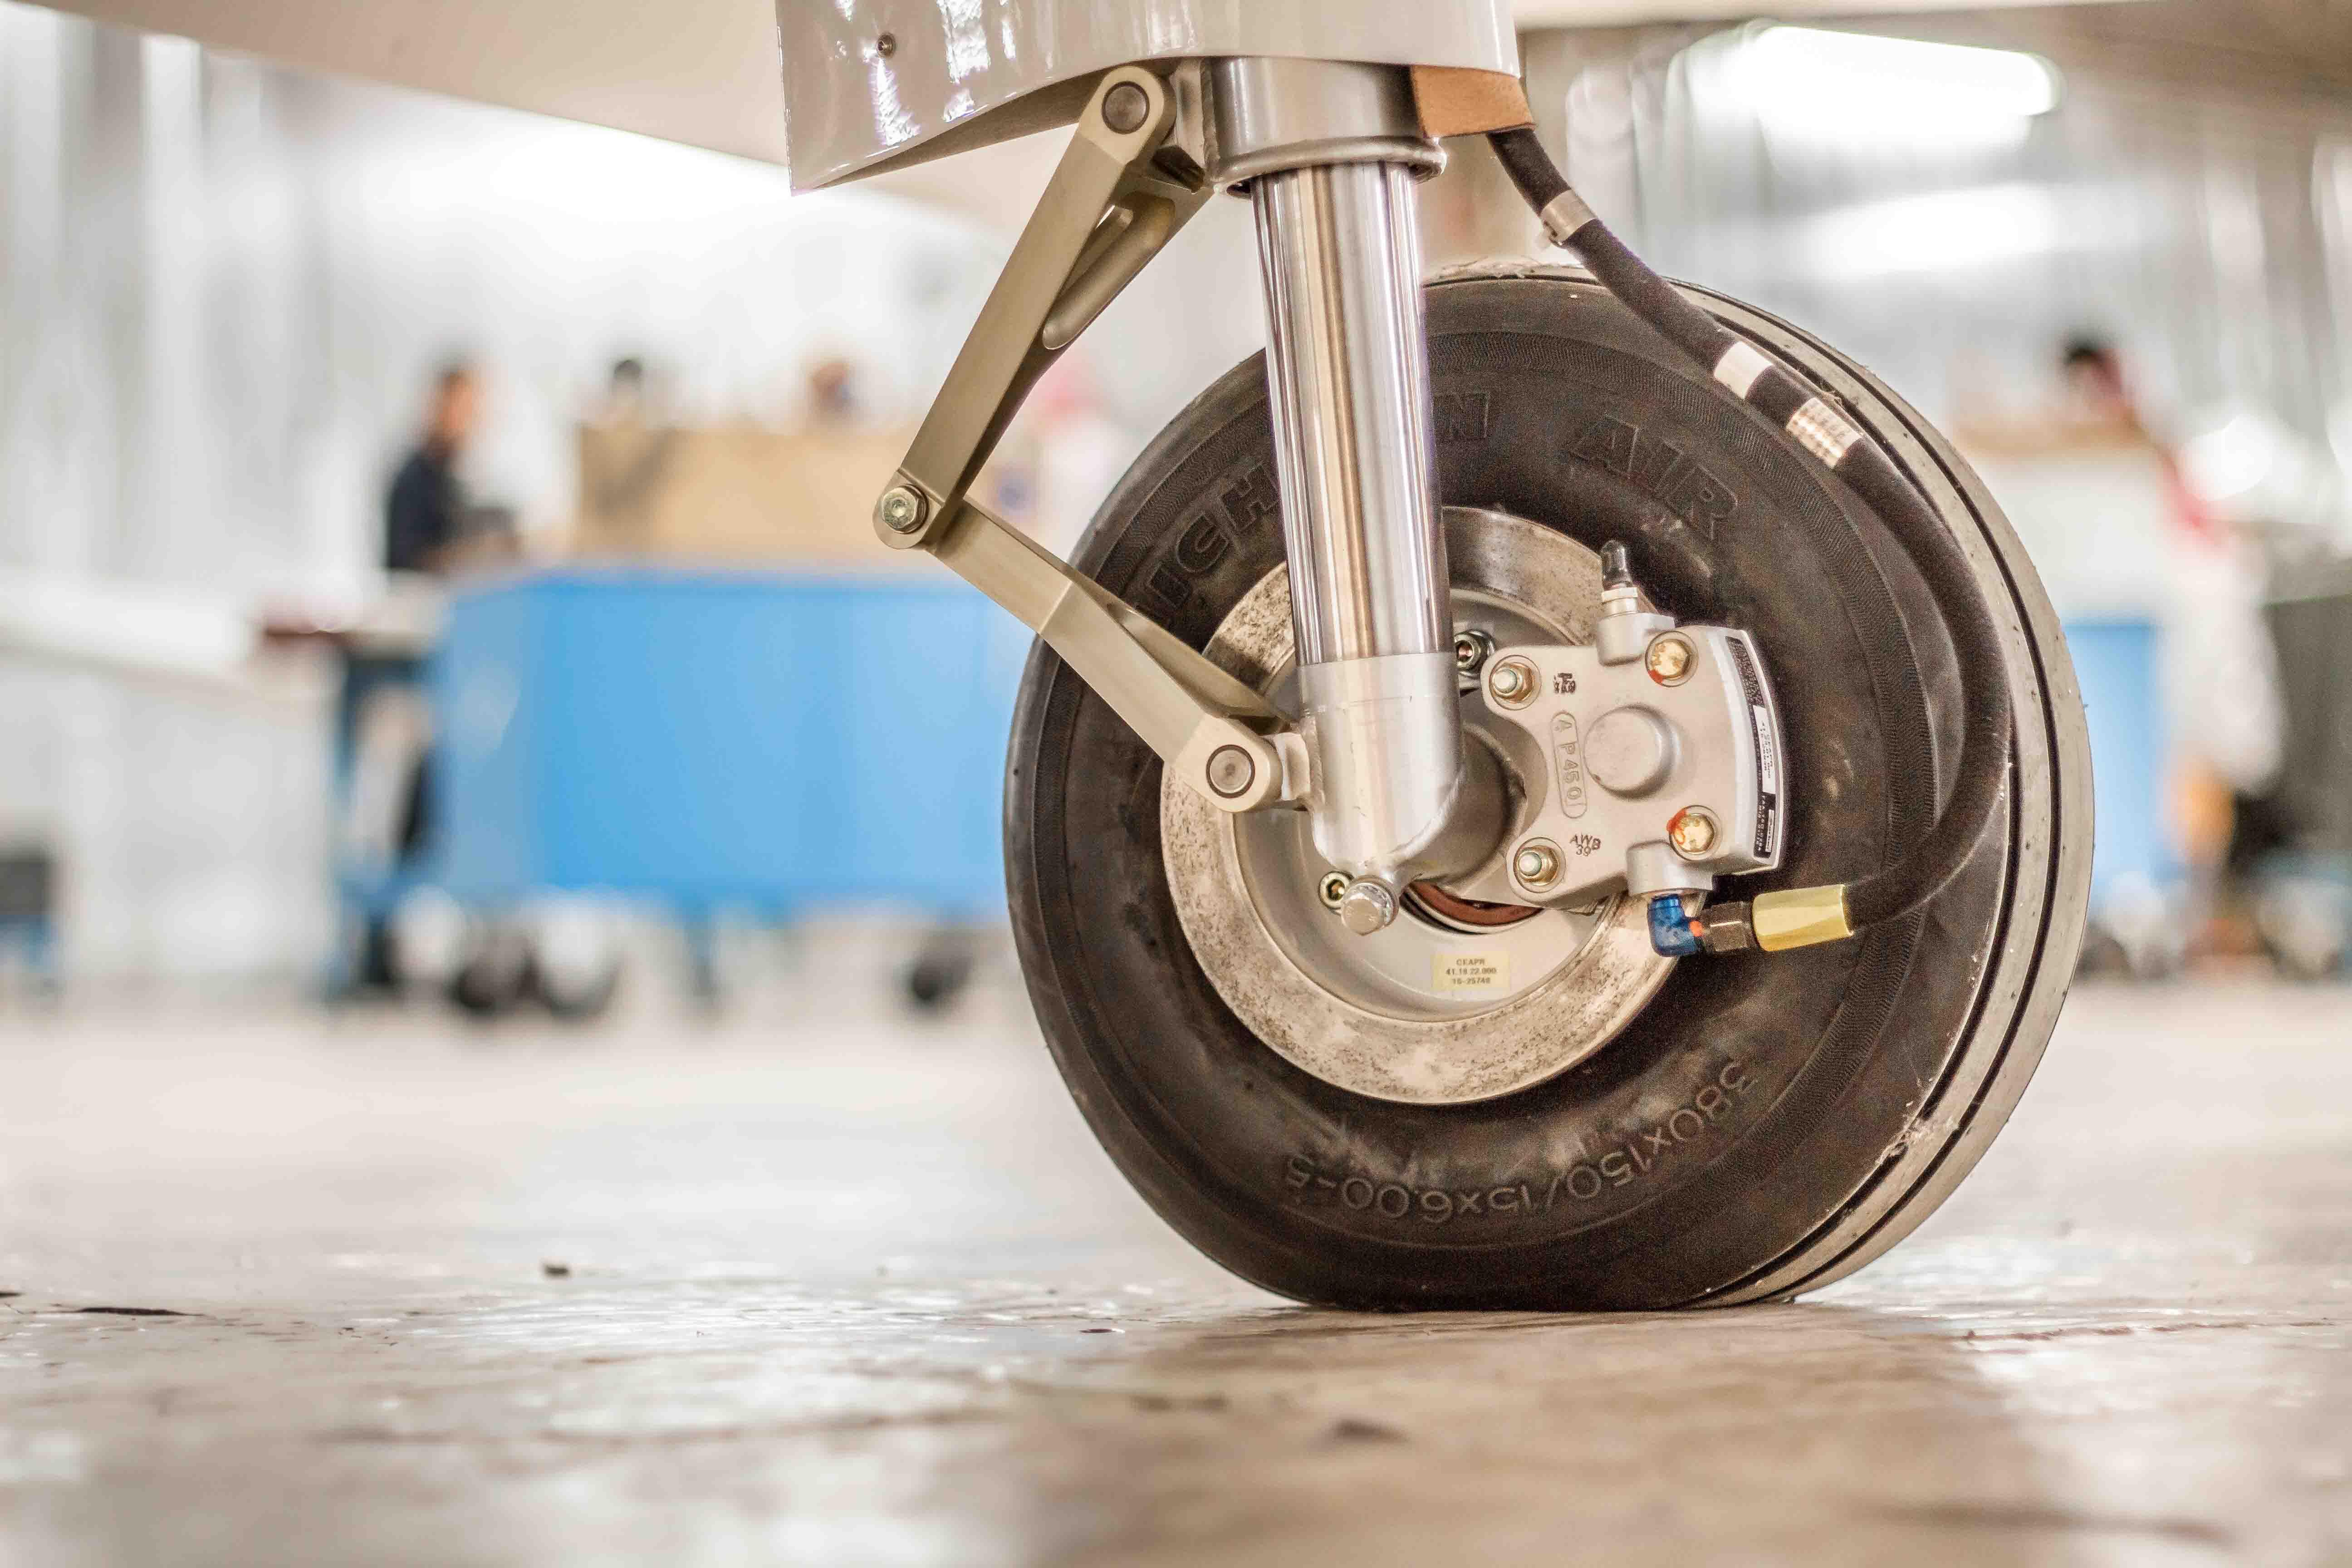 Freins, Robin-aircraft, DR400, DR401, Feu, Freinage, Astuces, Ateliers